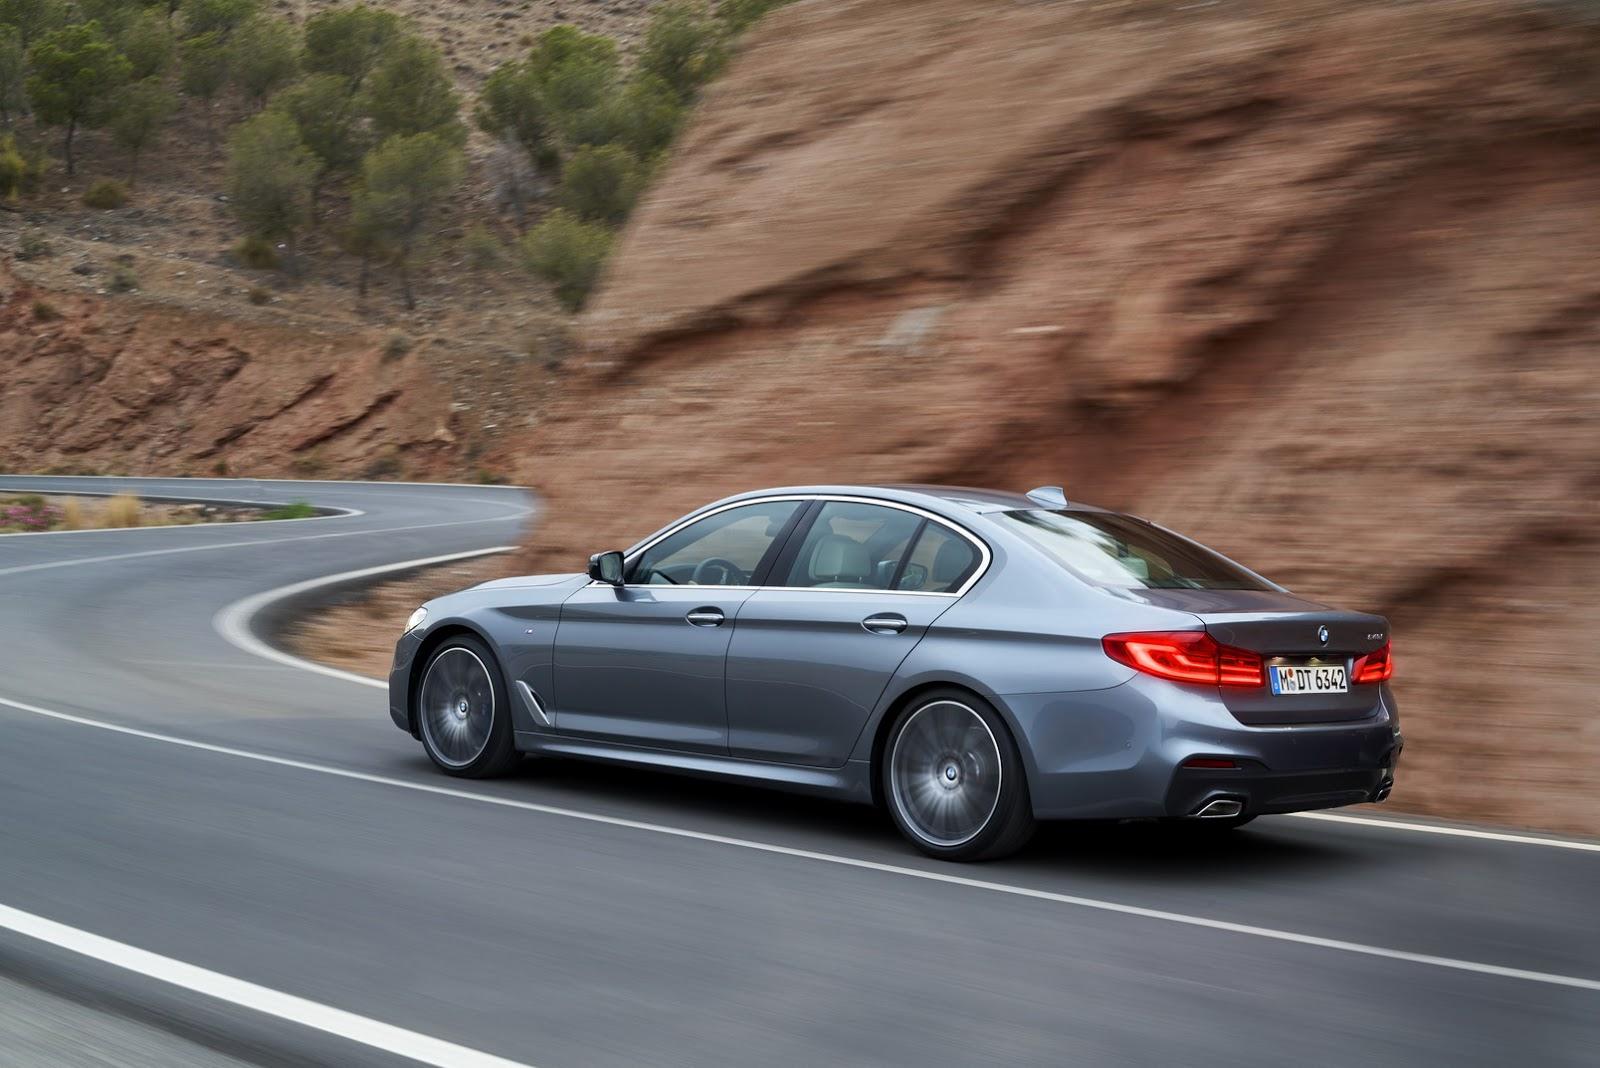 2017-BMW-5-Series-46.jpg